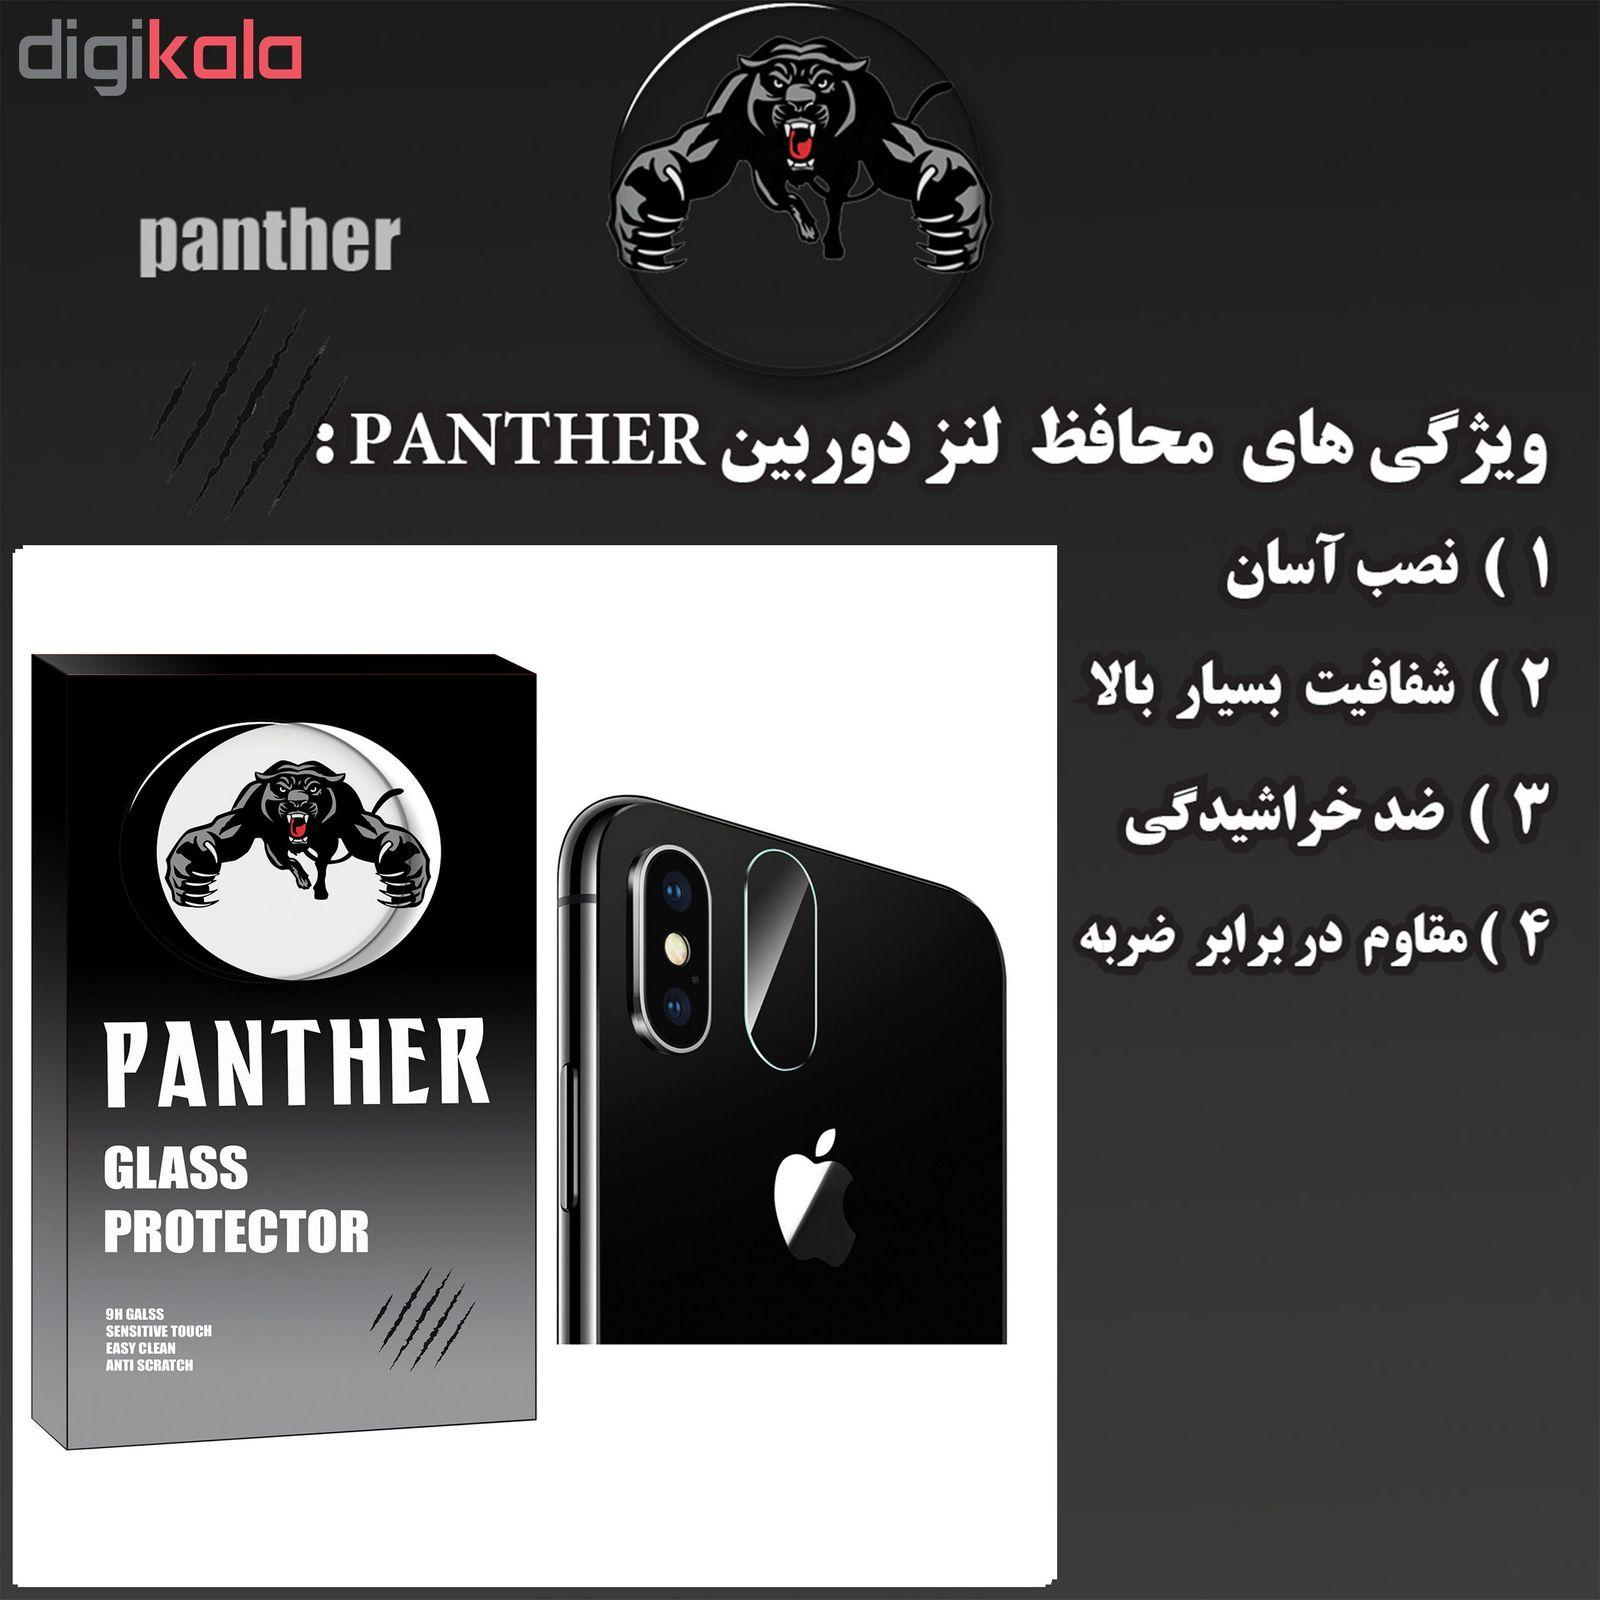 محافظ لنز دوربین پنتر مدل SDP-001 مناسب برای گوشی موبایل اپل iPhone X / Xs main 1 1